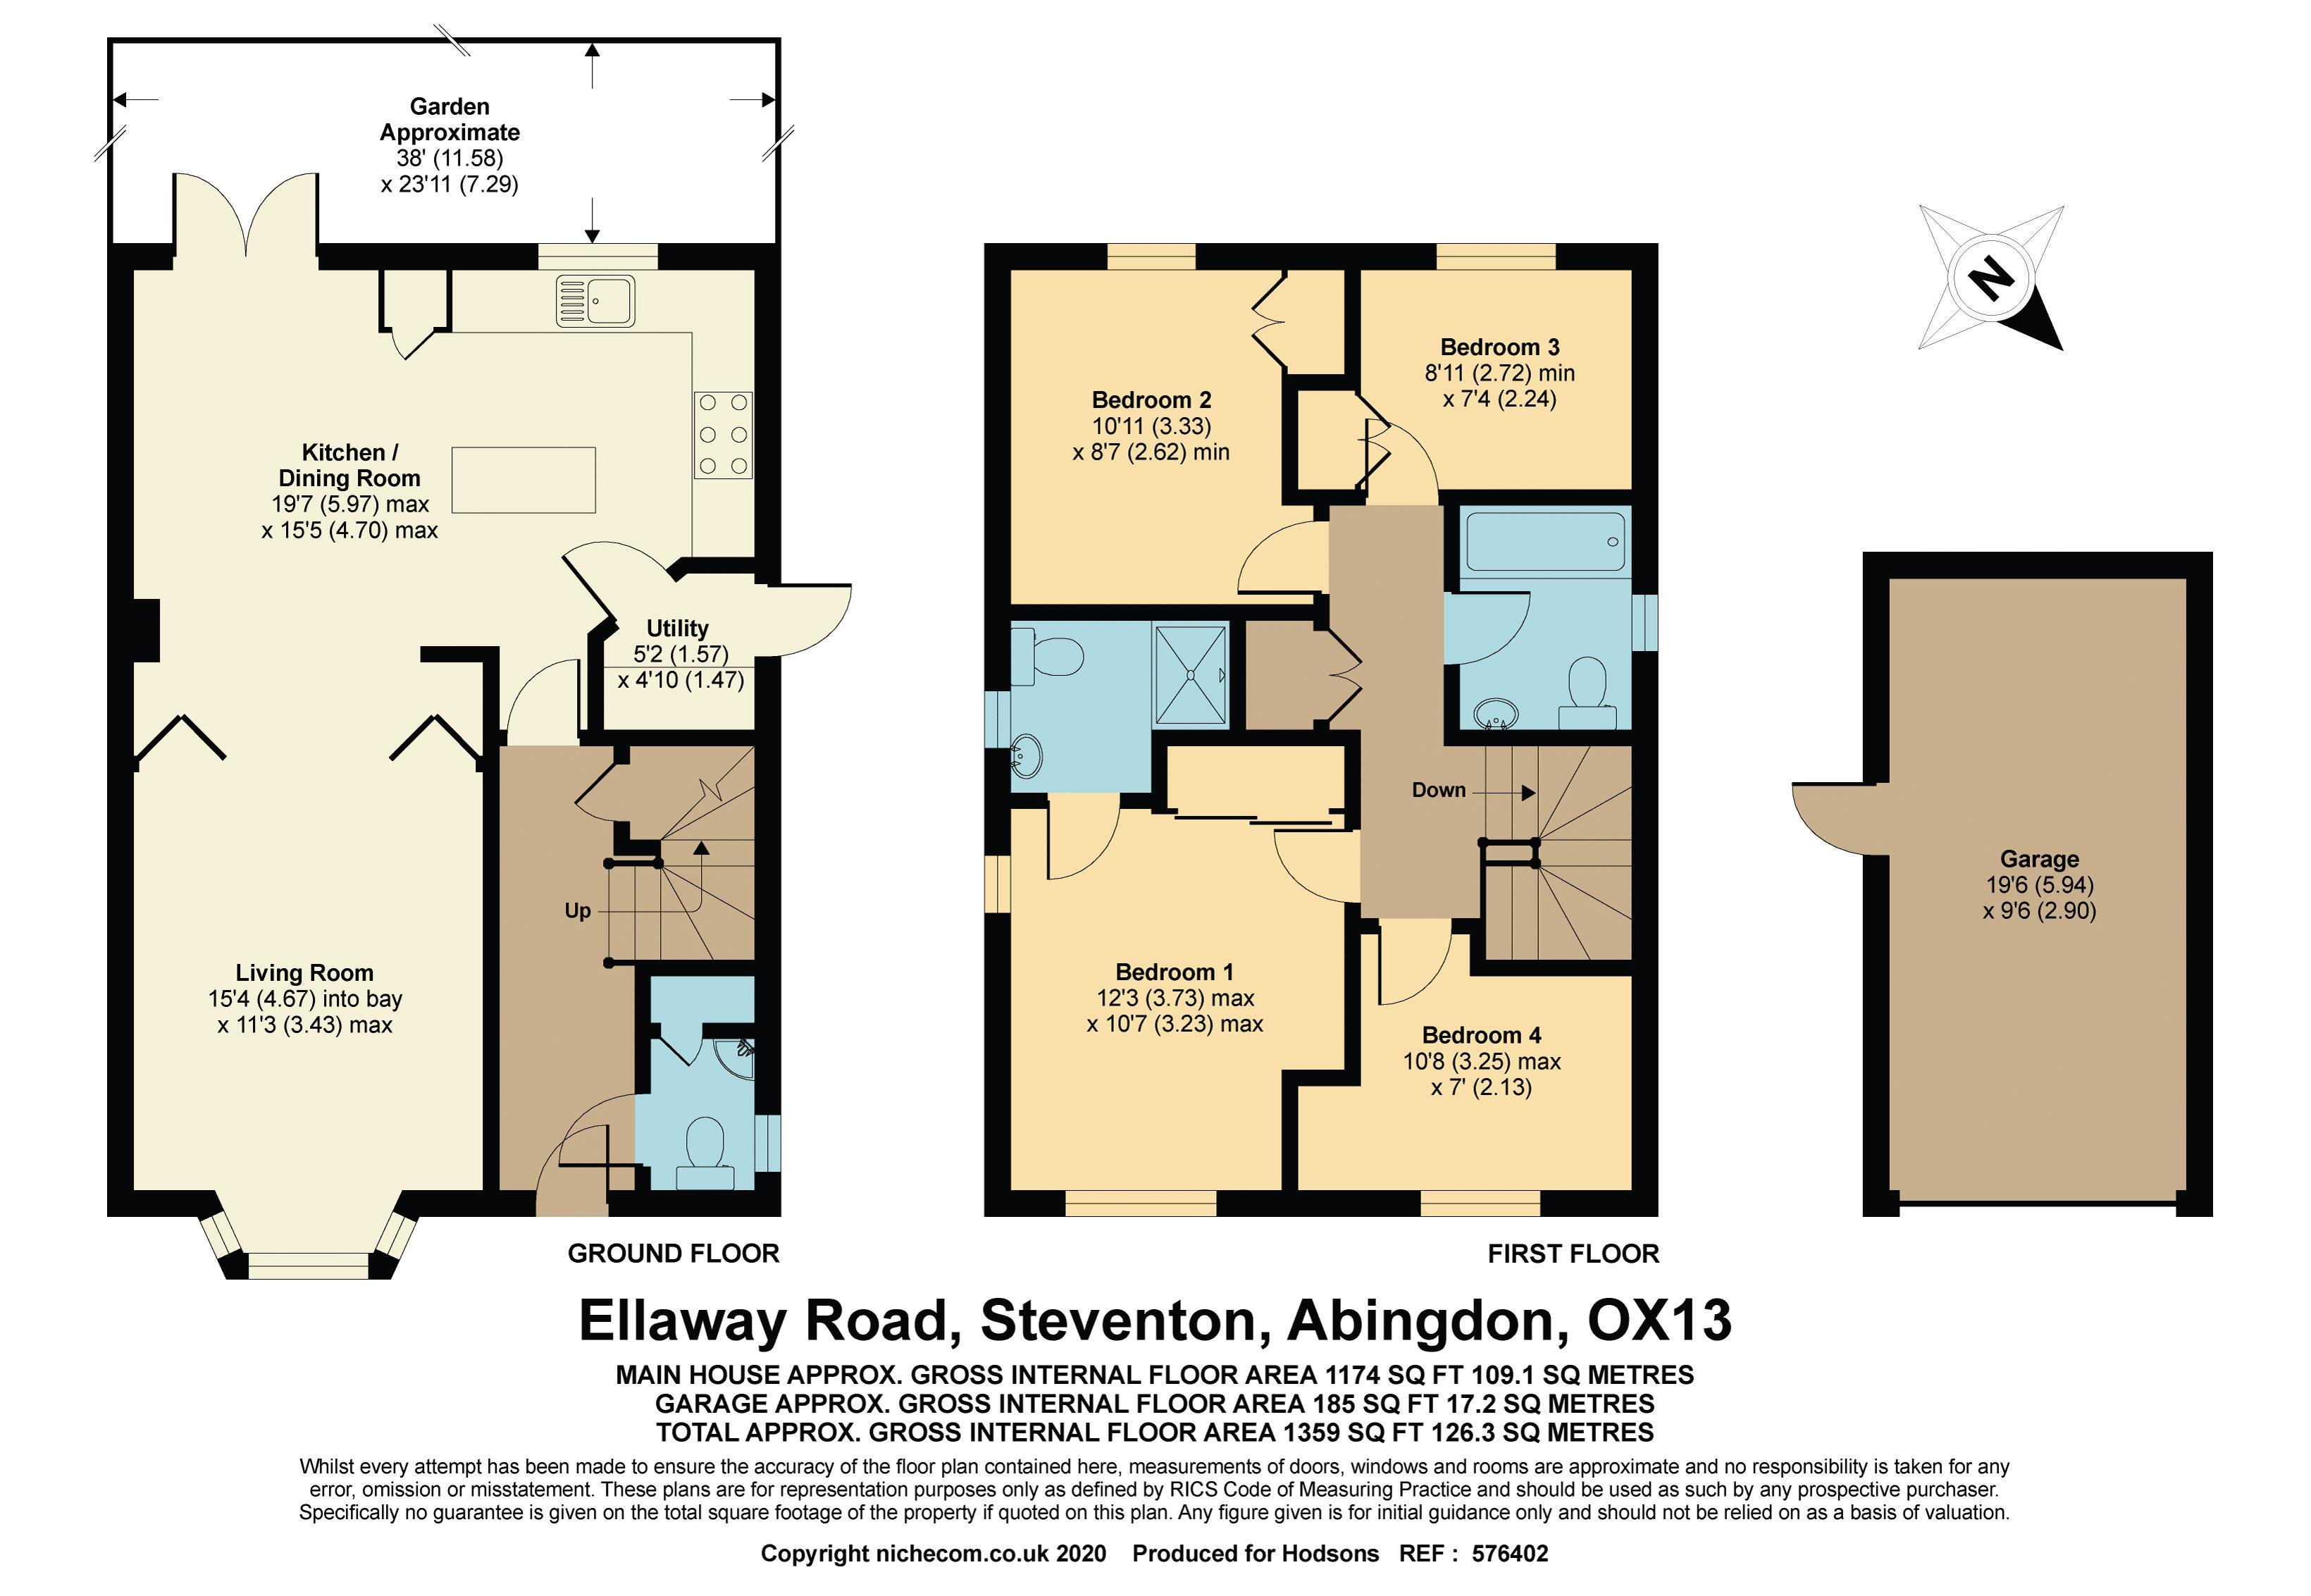 Ellaway Road Steventon